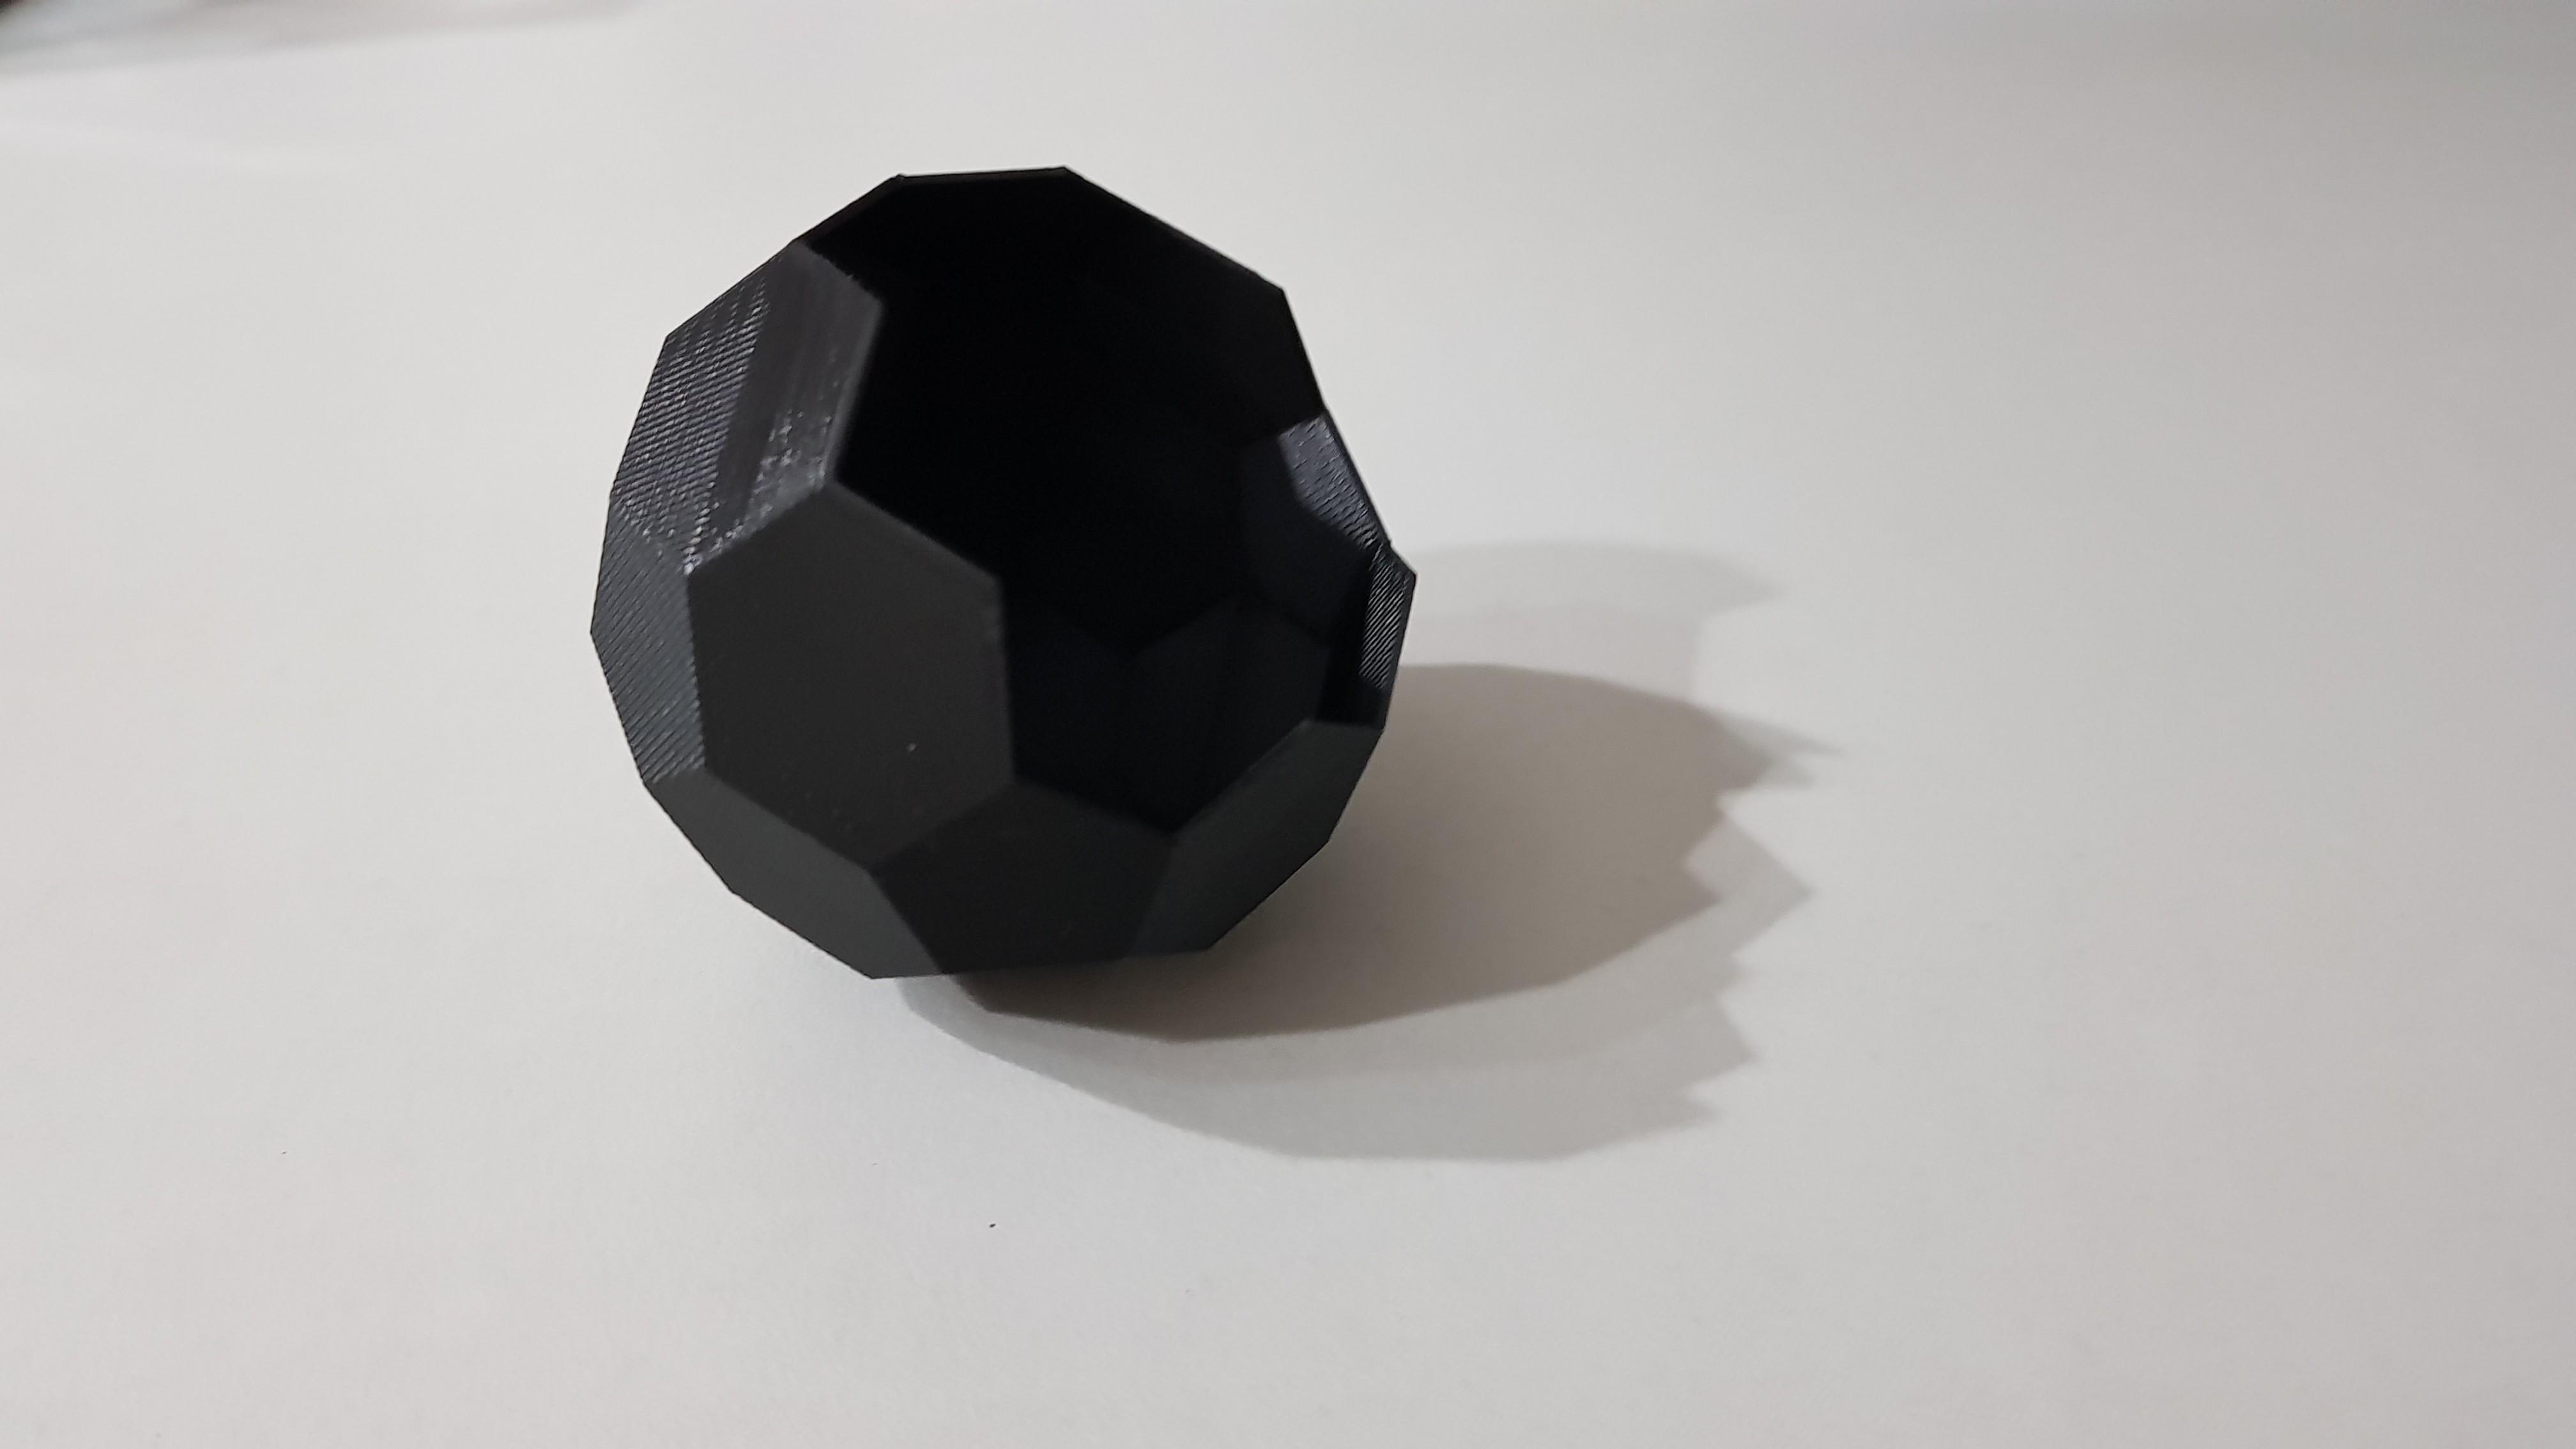 20180208_194219.jpg Download free STL file Mini planter • 3D printing design, solunkejagruti